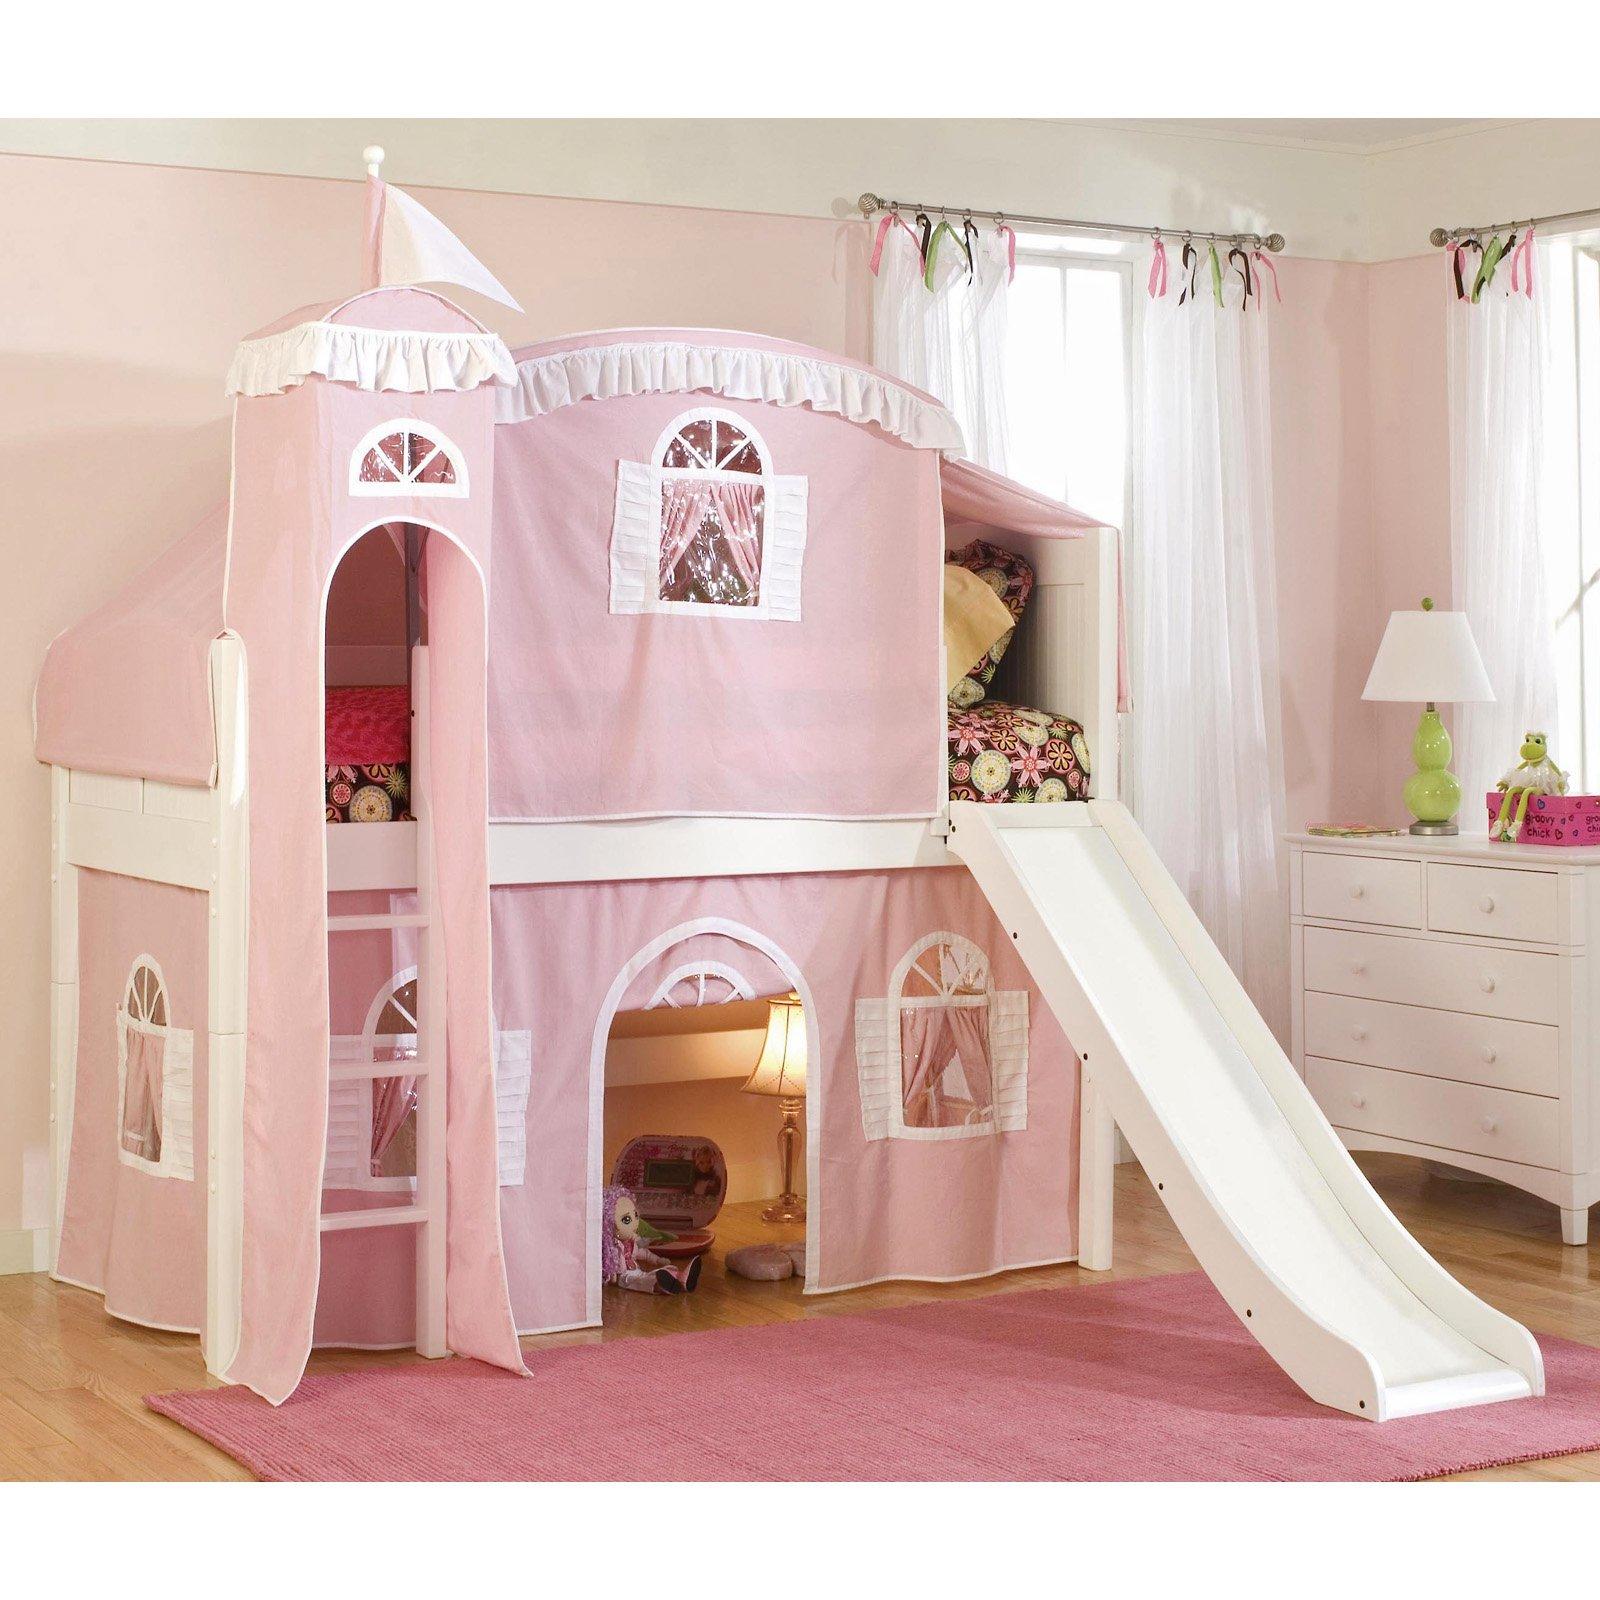 Cottage Deluxe Low Loft Tent Bed